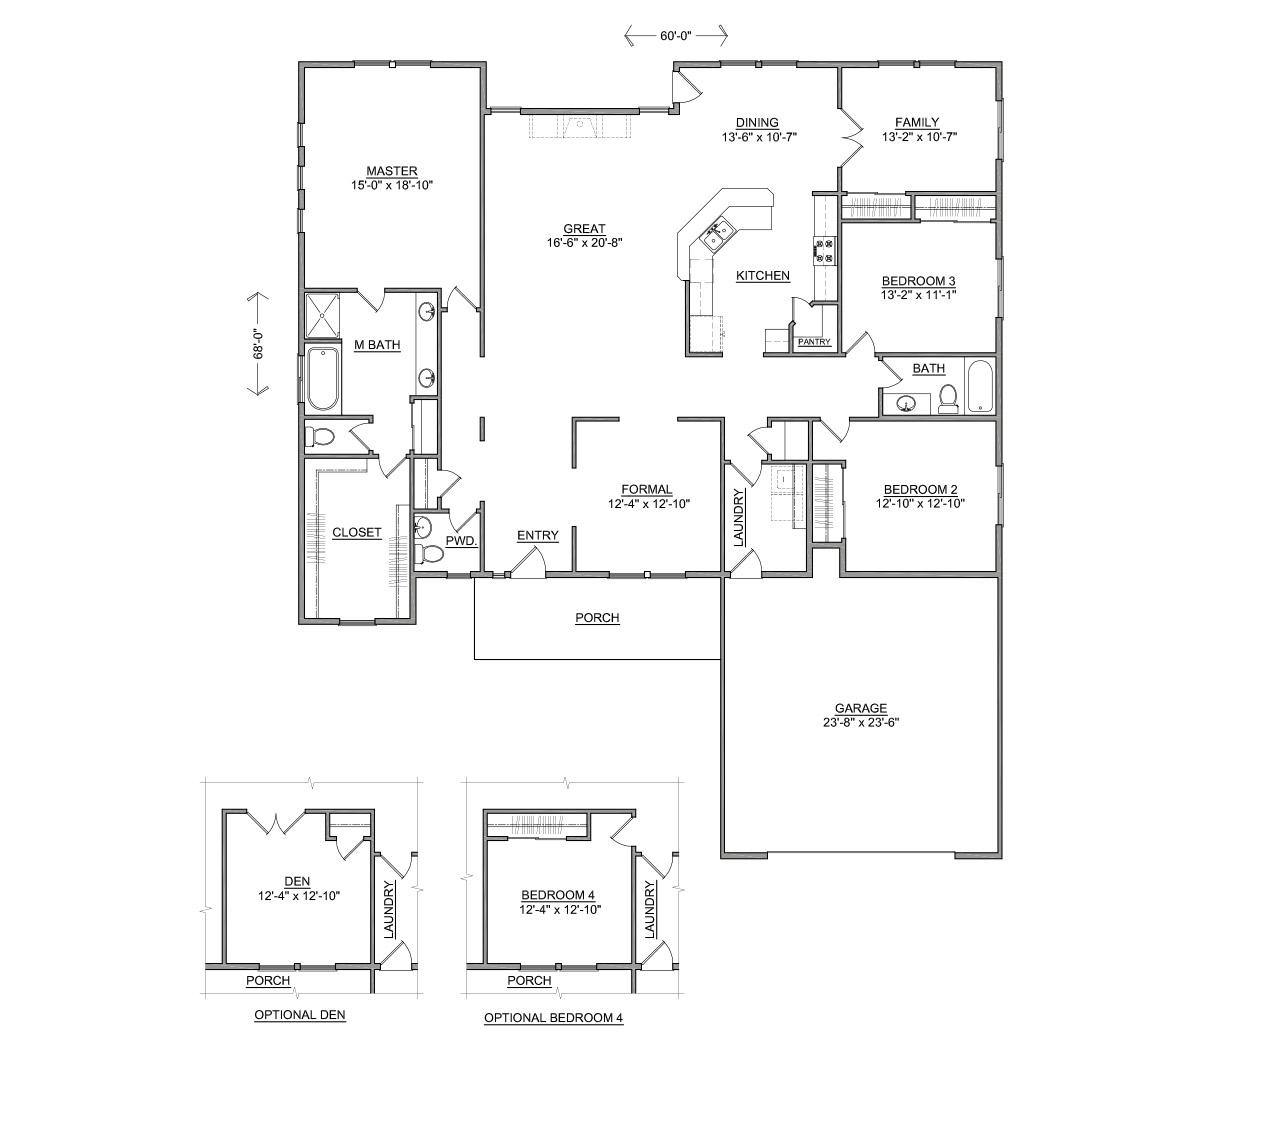 The vintage beautiful new home by hayden homes for Hayden homes floor plans